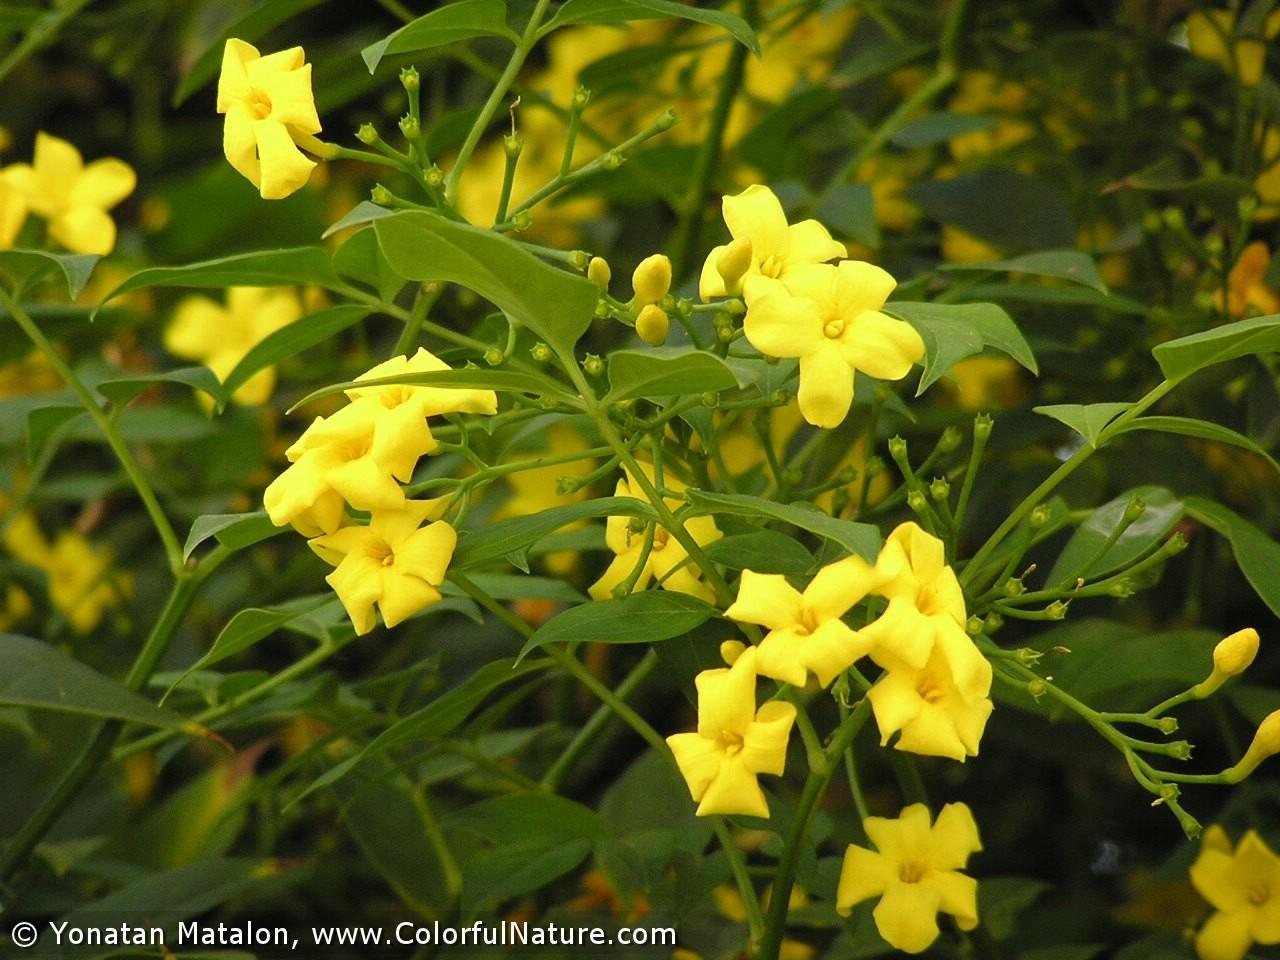 Цветки и веточки жасмина Низкого